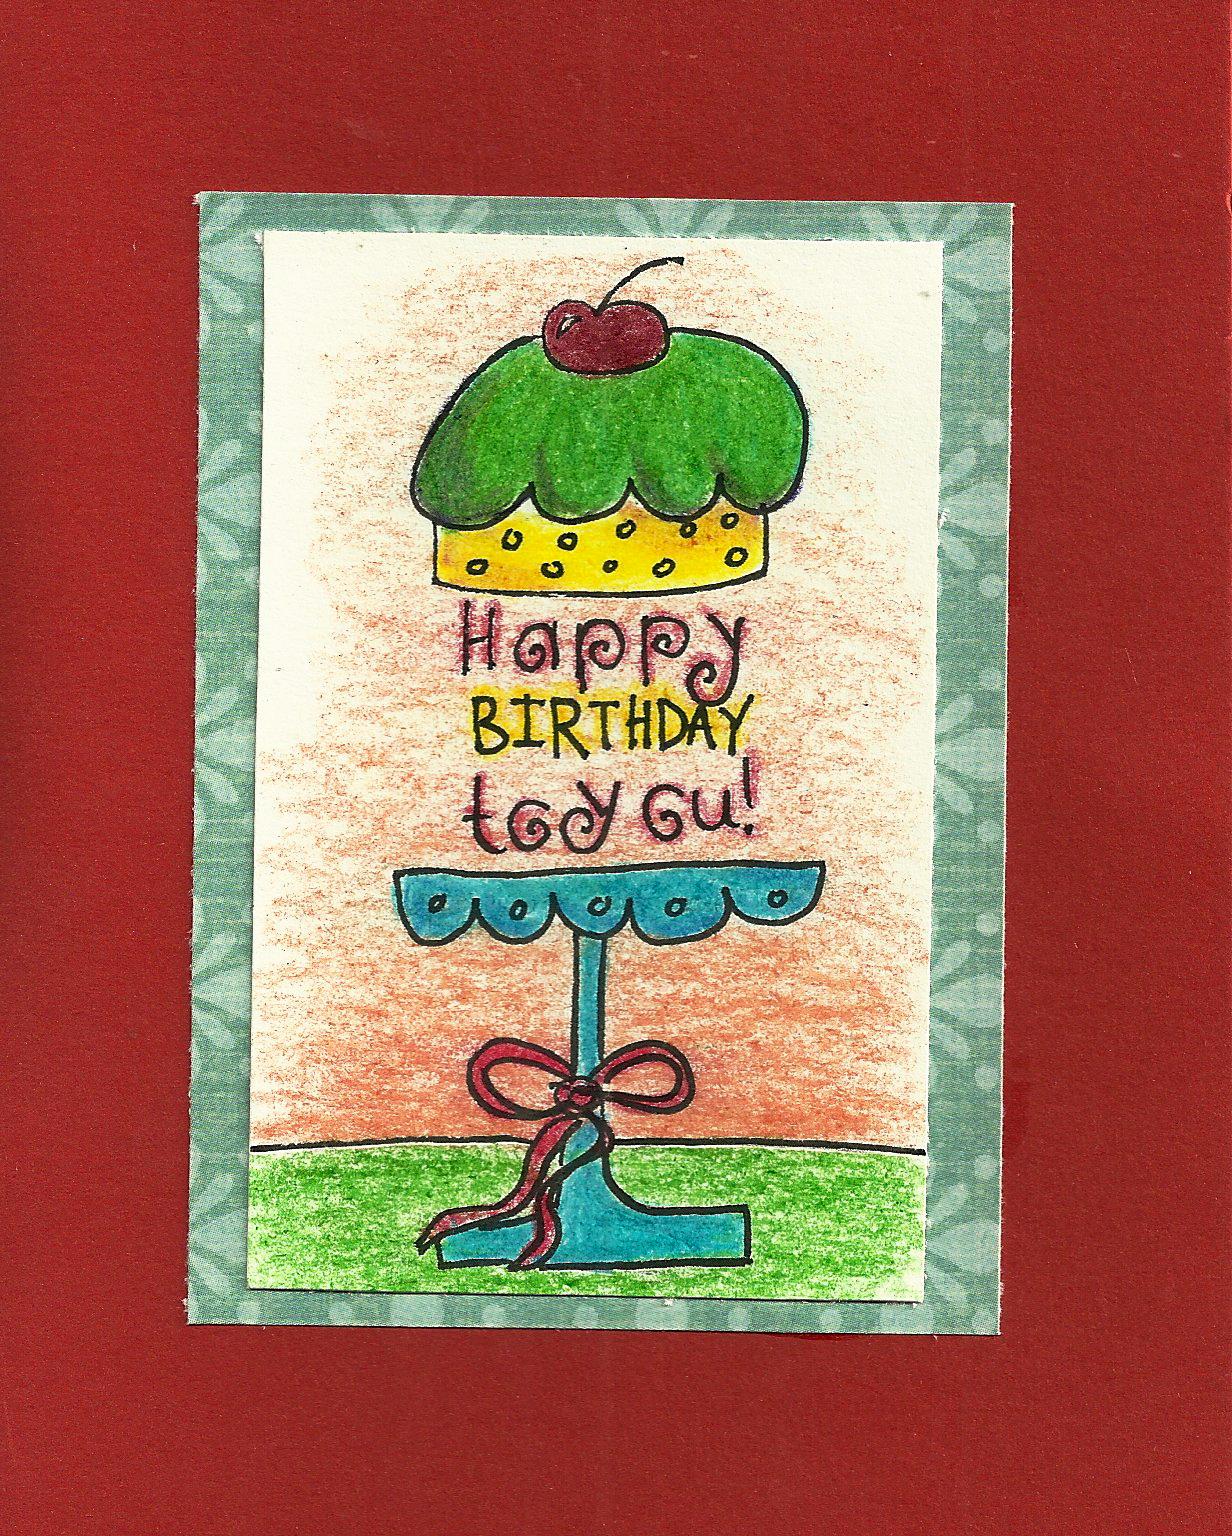 Debbie Dots Greeting Card Blog: Cake Stand Birthday